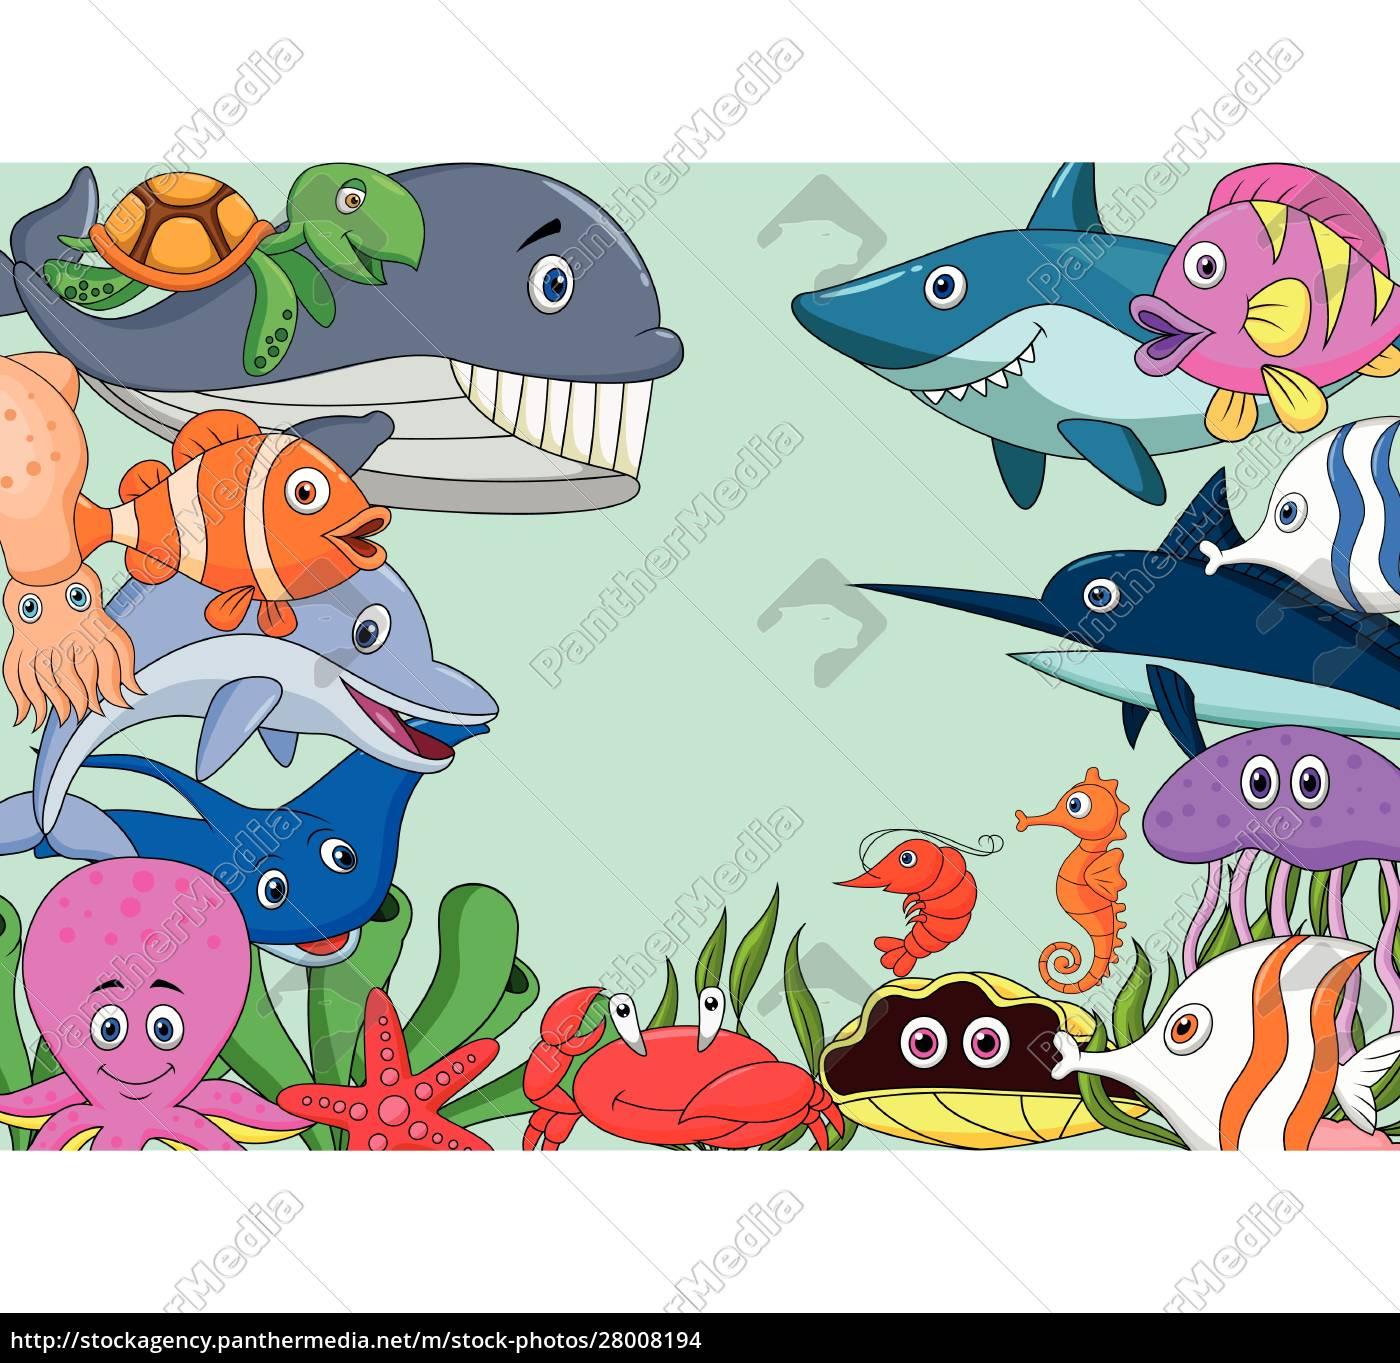 sfondo, cartone, animato, vita, marina - 28008194